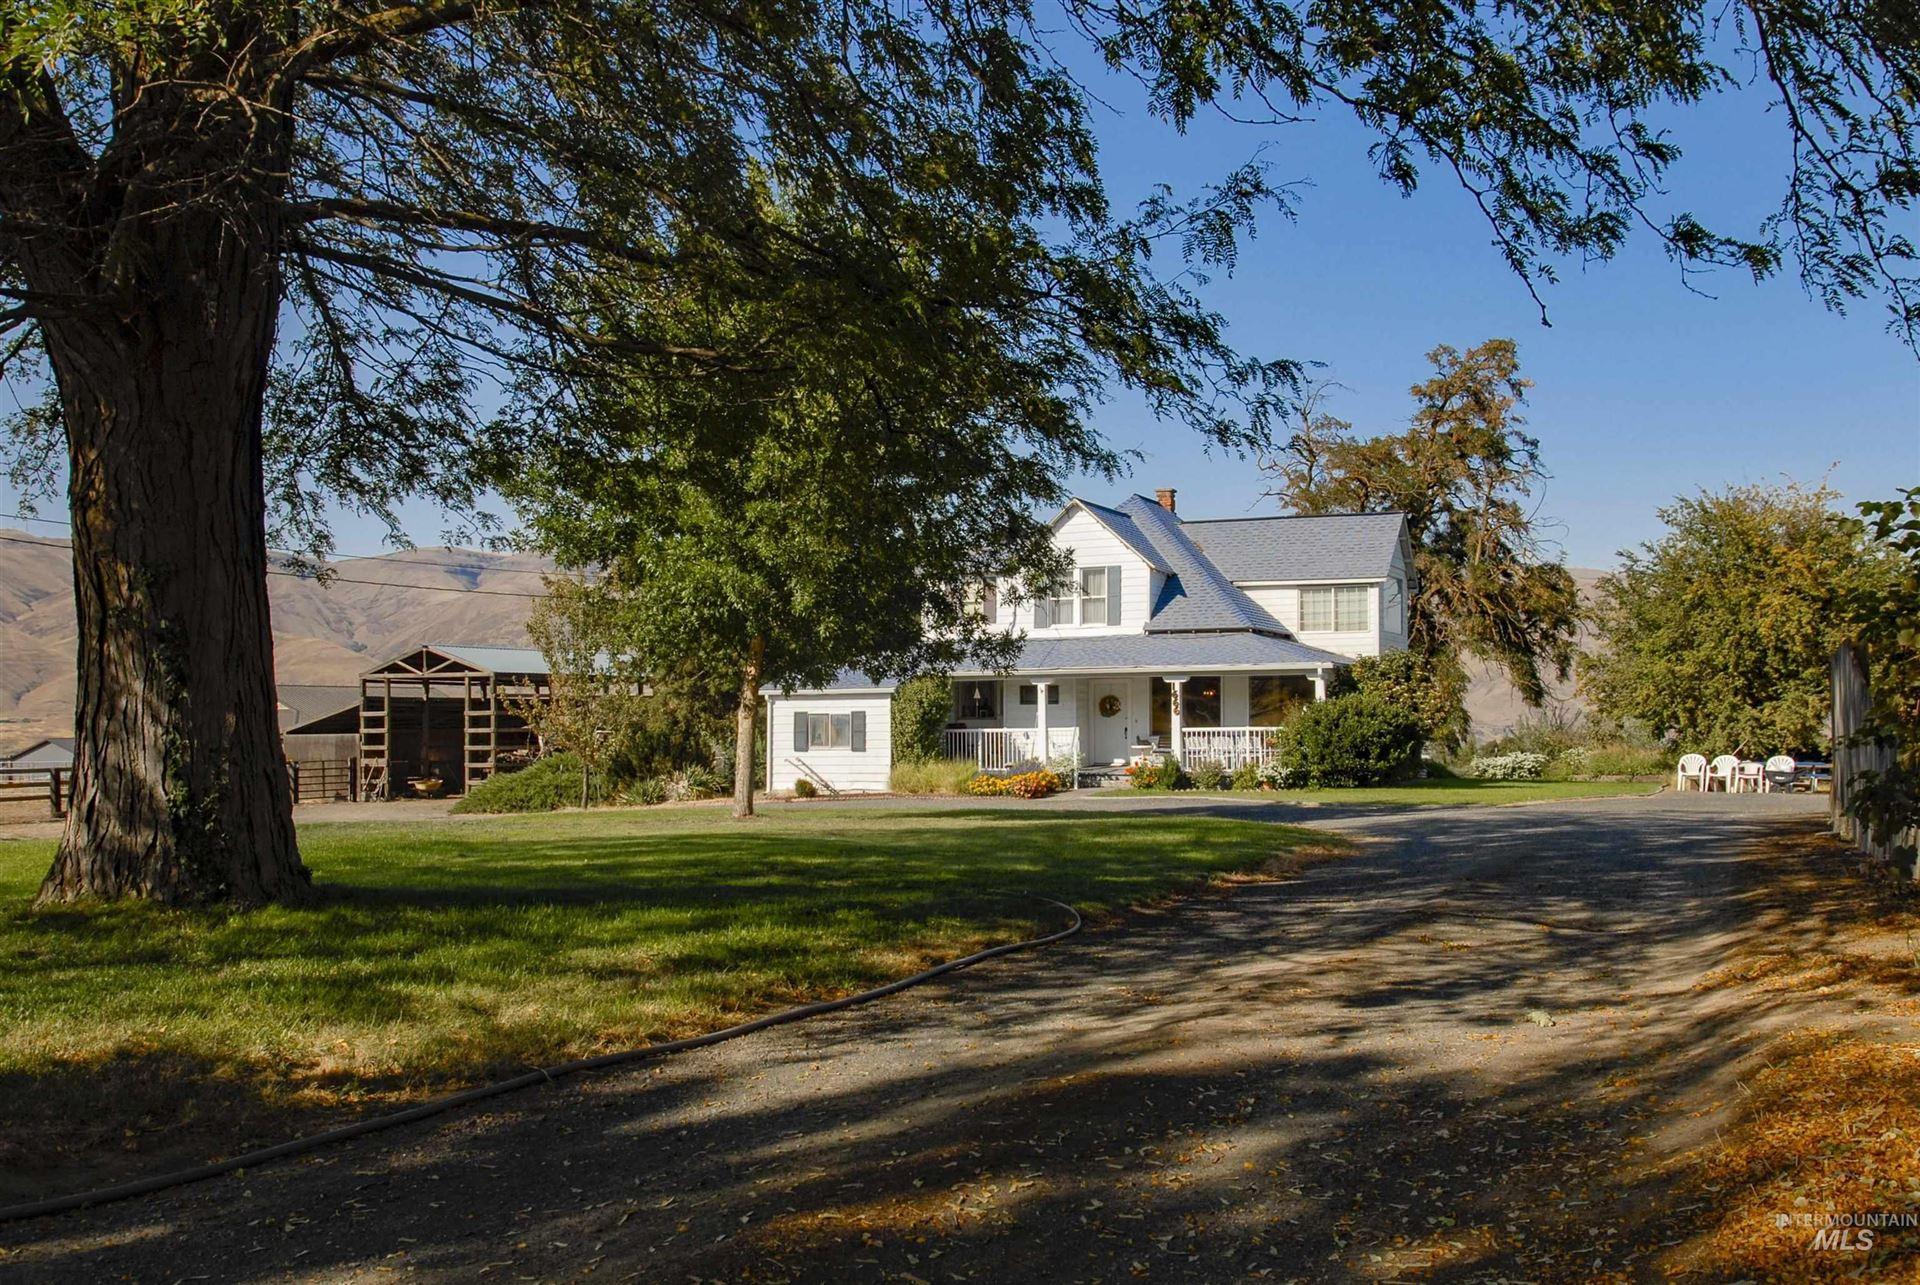 1666 Dustan Loop, Clarkston, WA 99403 - MLS#: 98817743